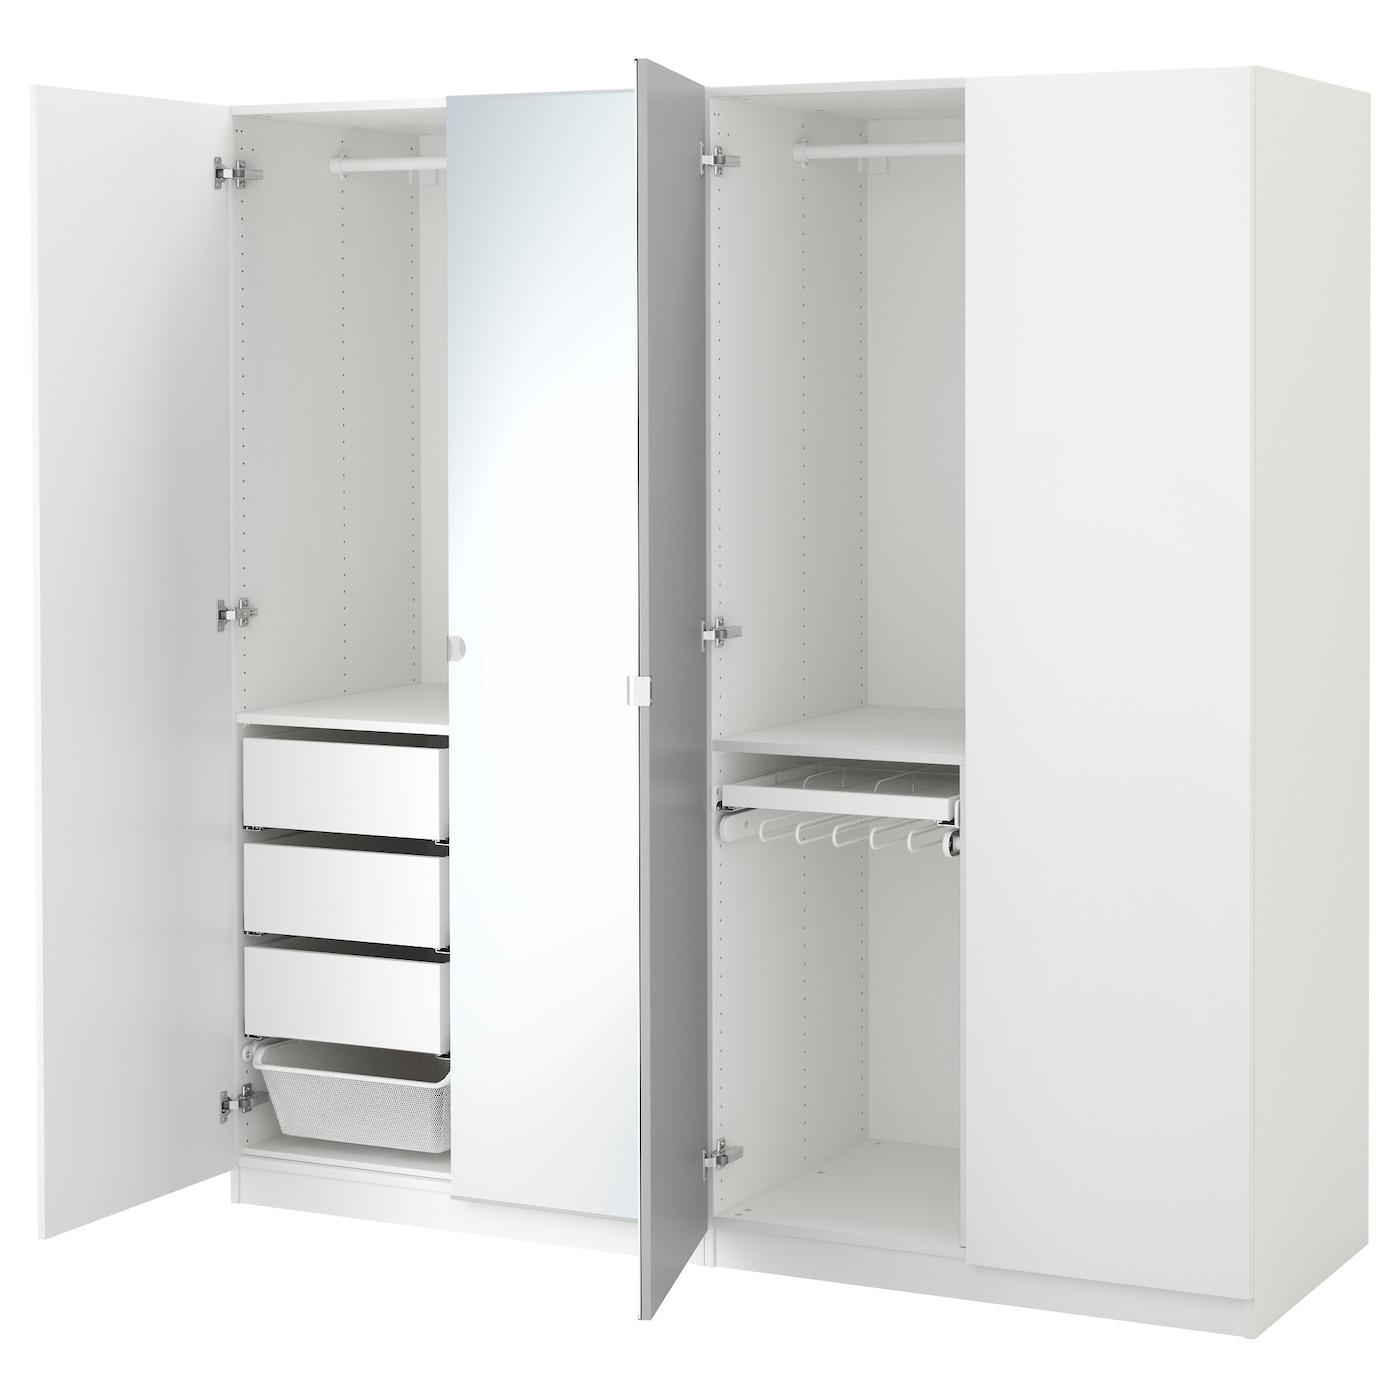 pax armoire penderie blanc forsand vikedal 200x60x201 cm ikea. Black Bedroom Furniture Sets. Home Design Ideas